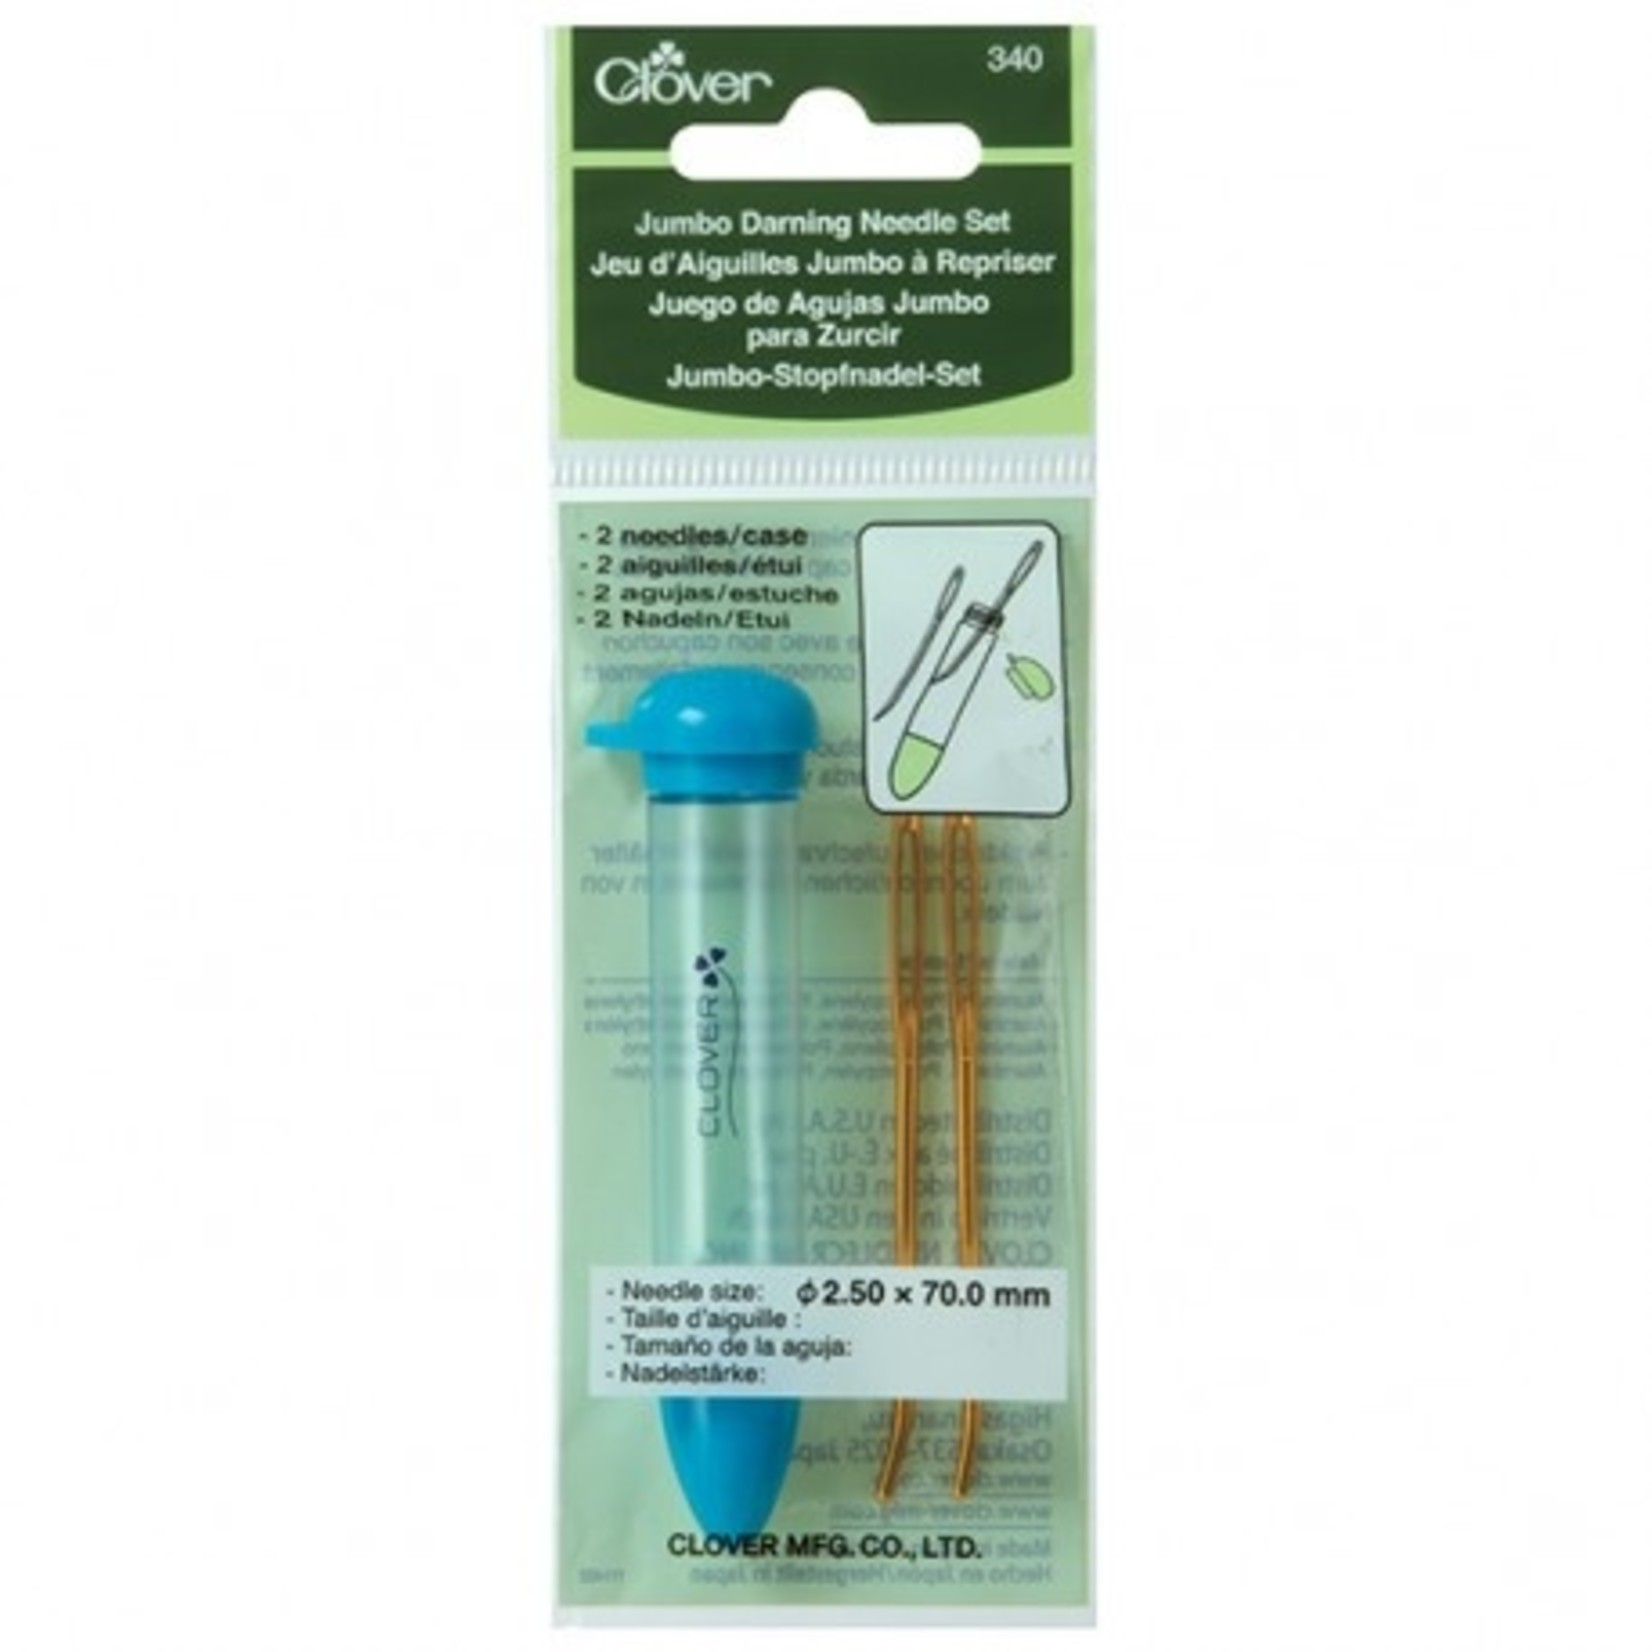 Clover Chibi Jumbo Darning Needle  (340) by Clover